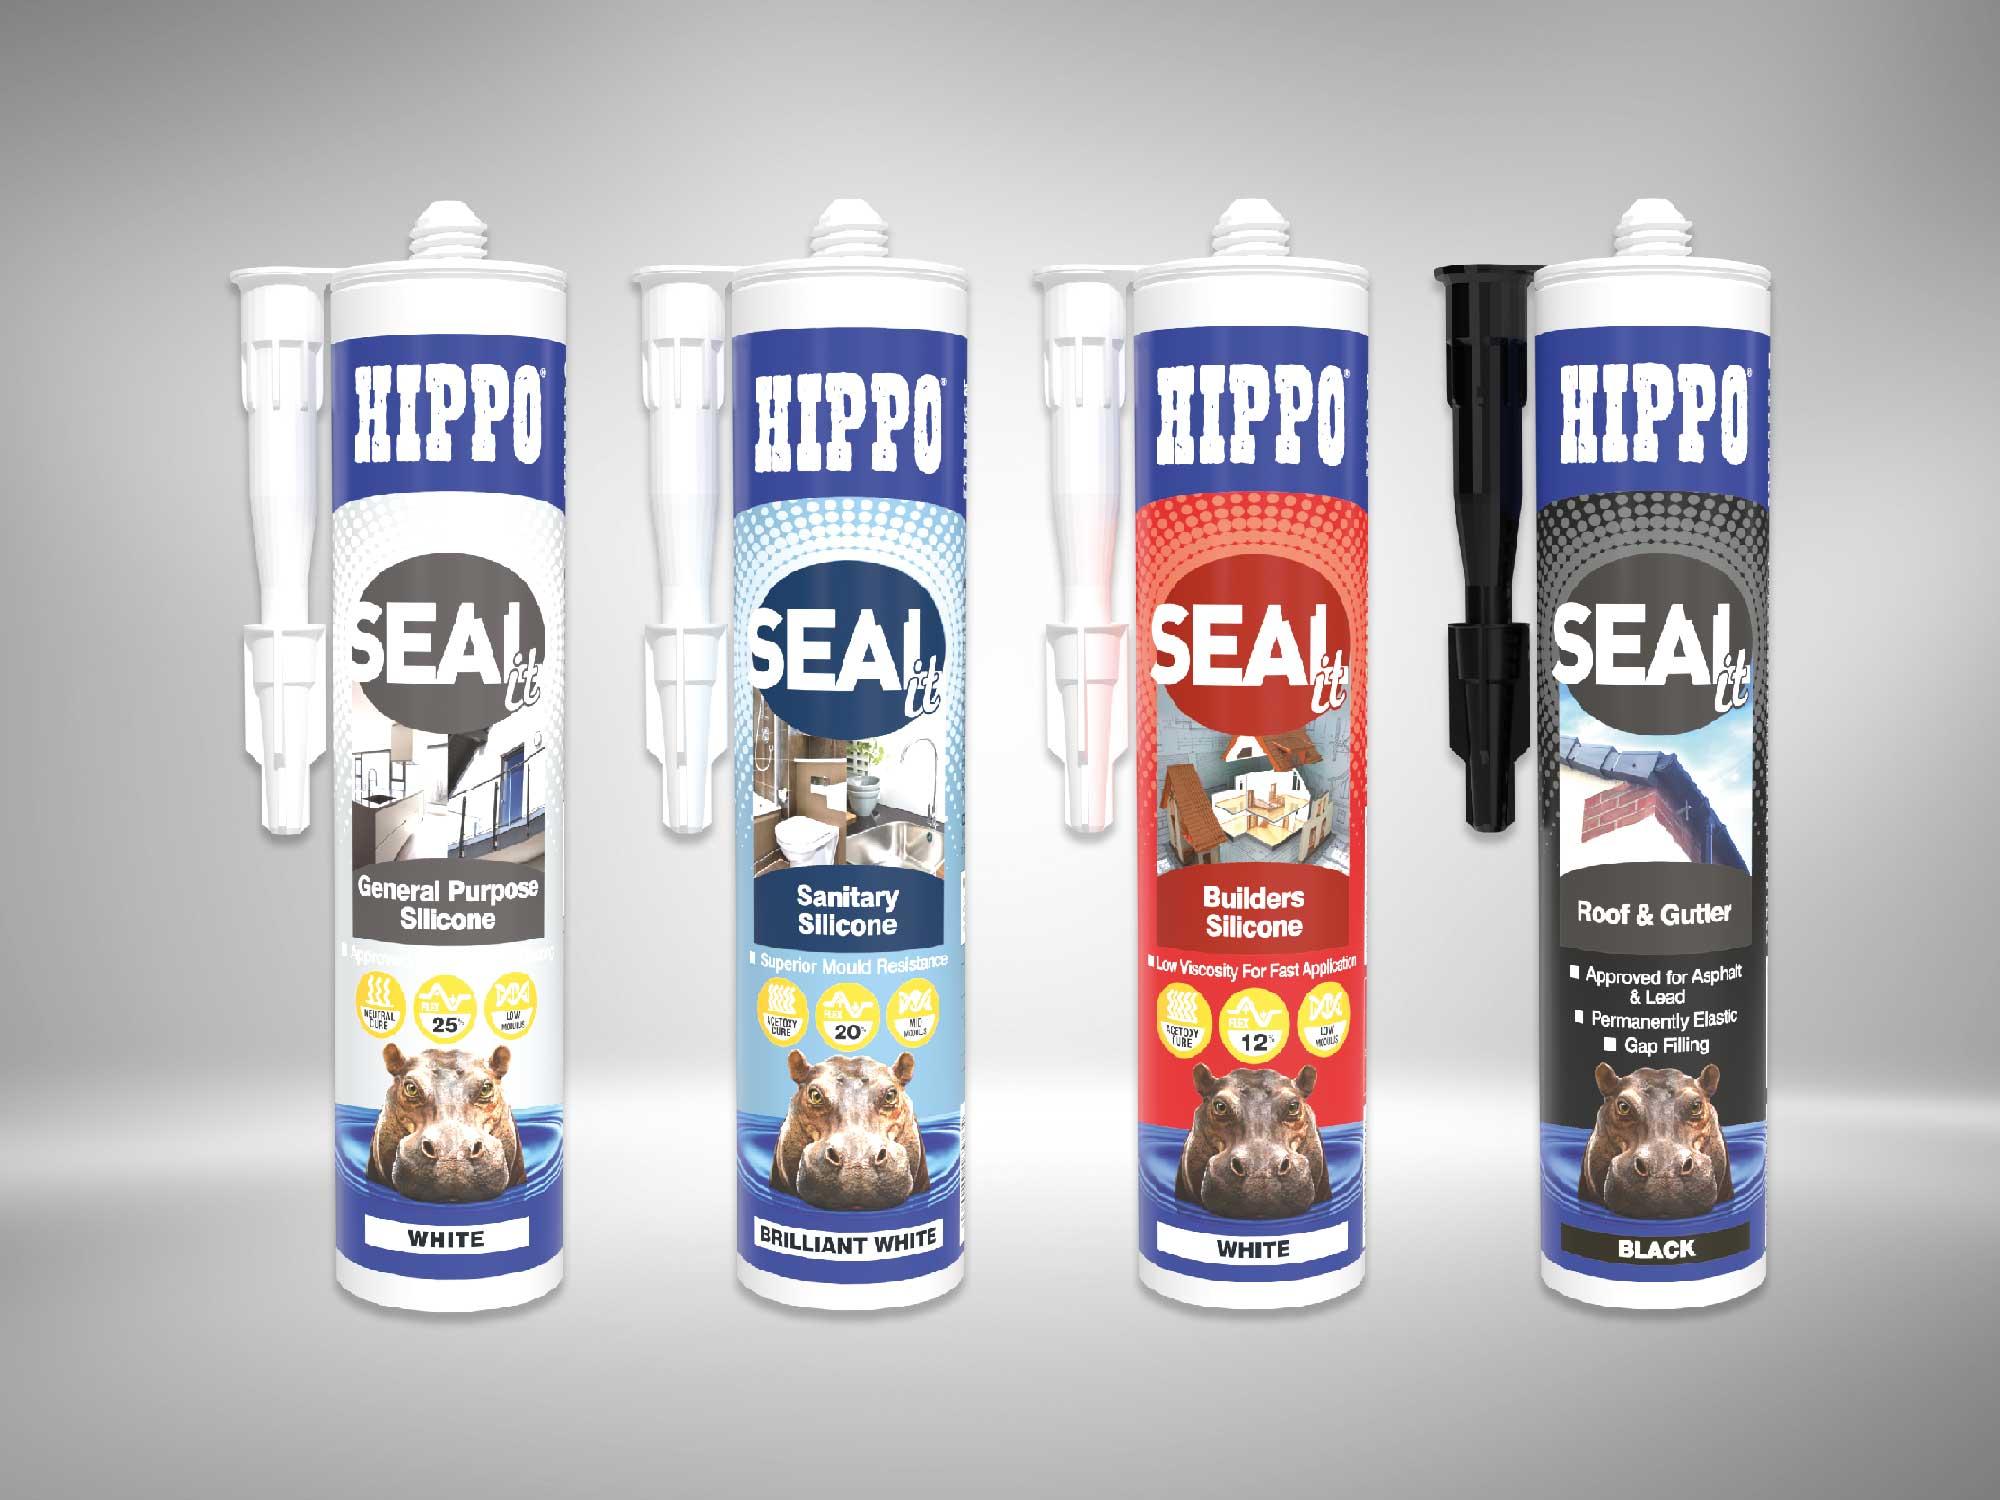 Hippo SEALit Product Range